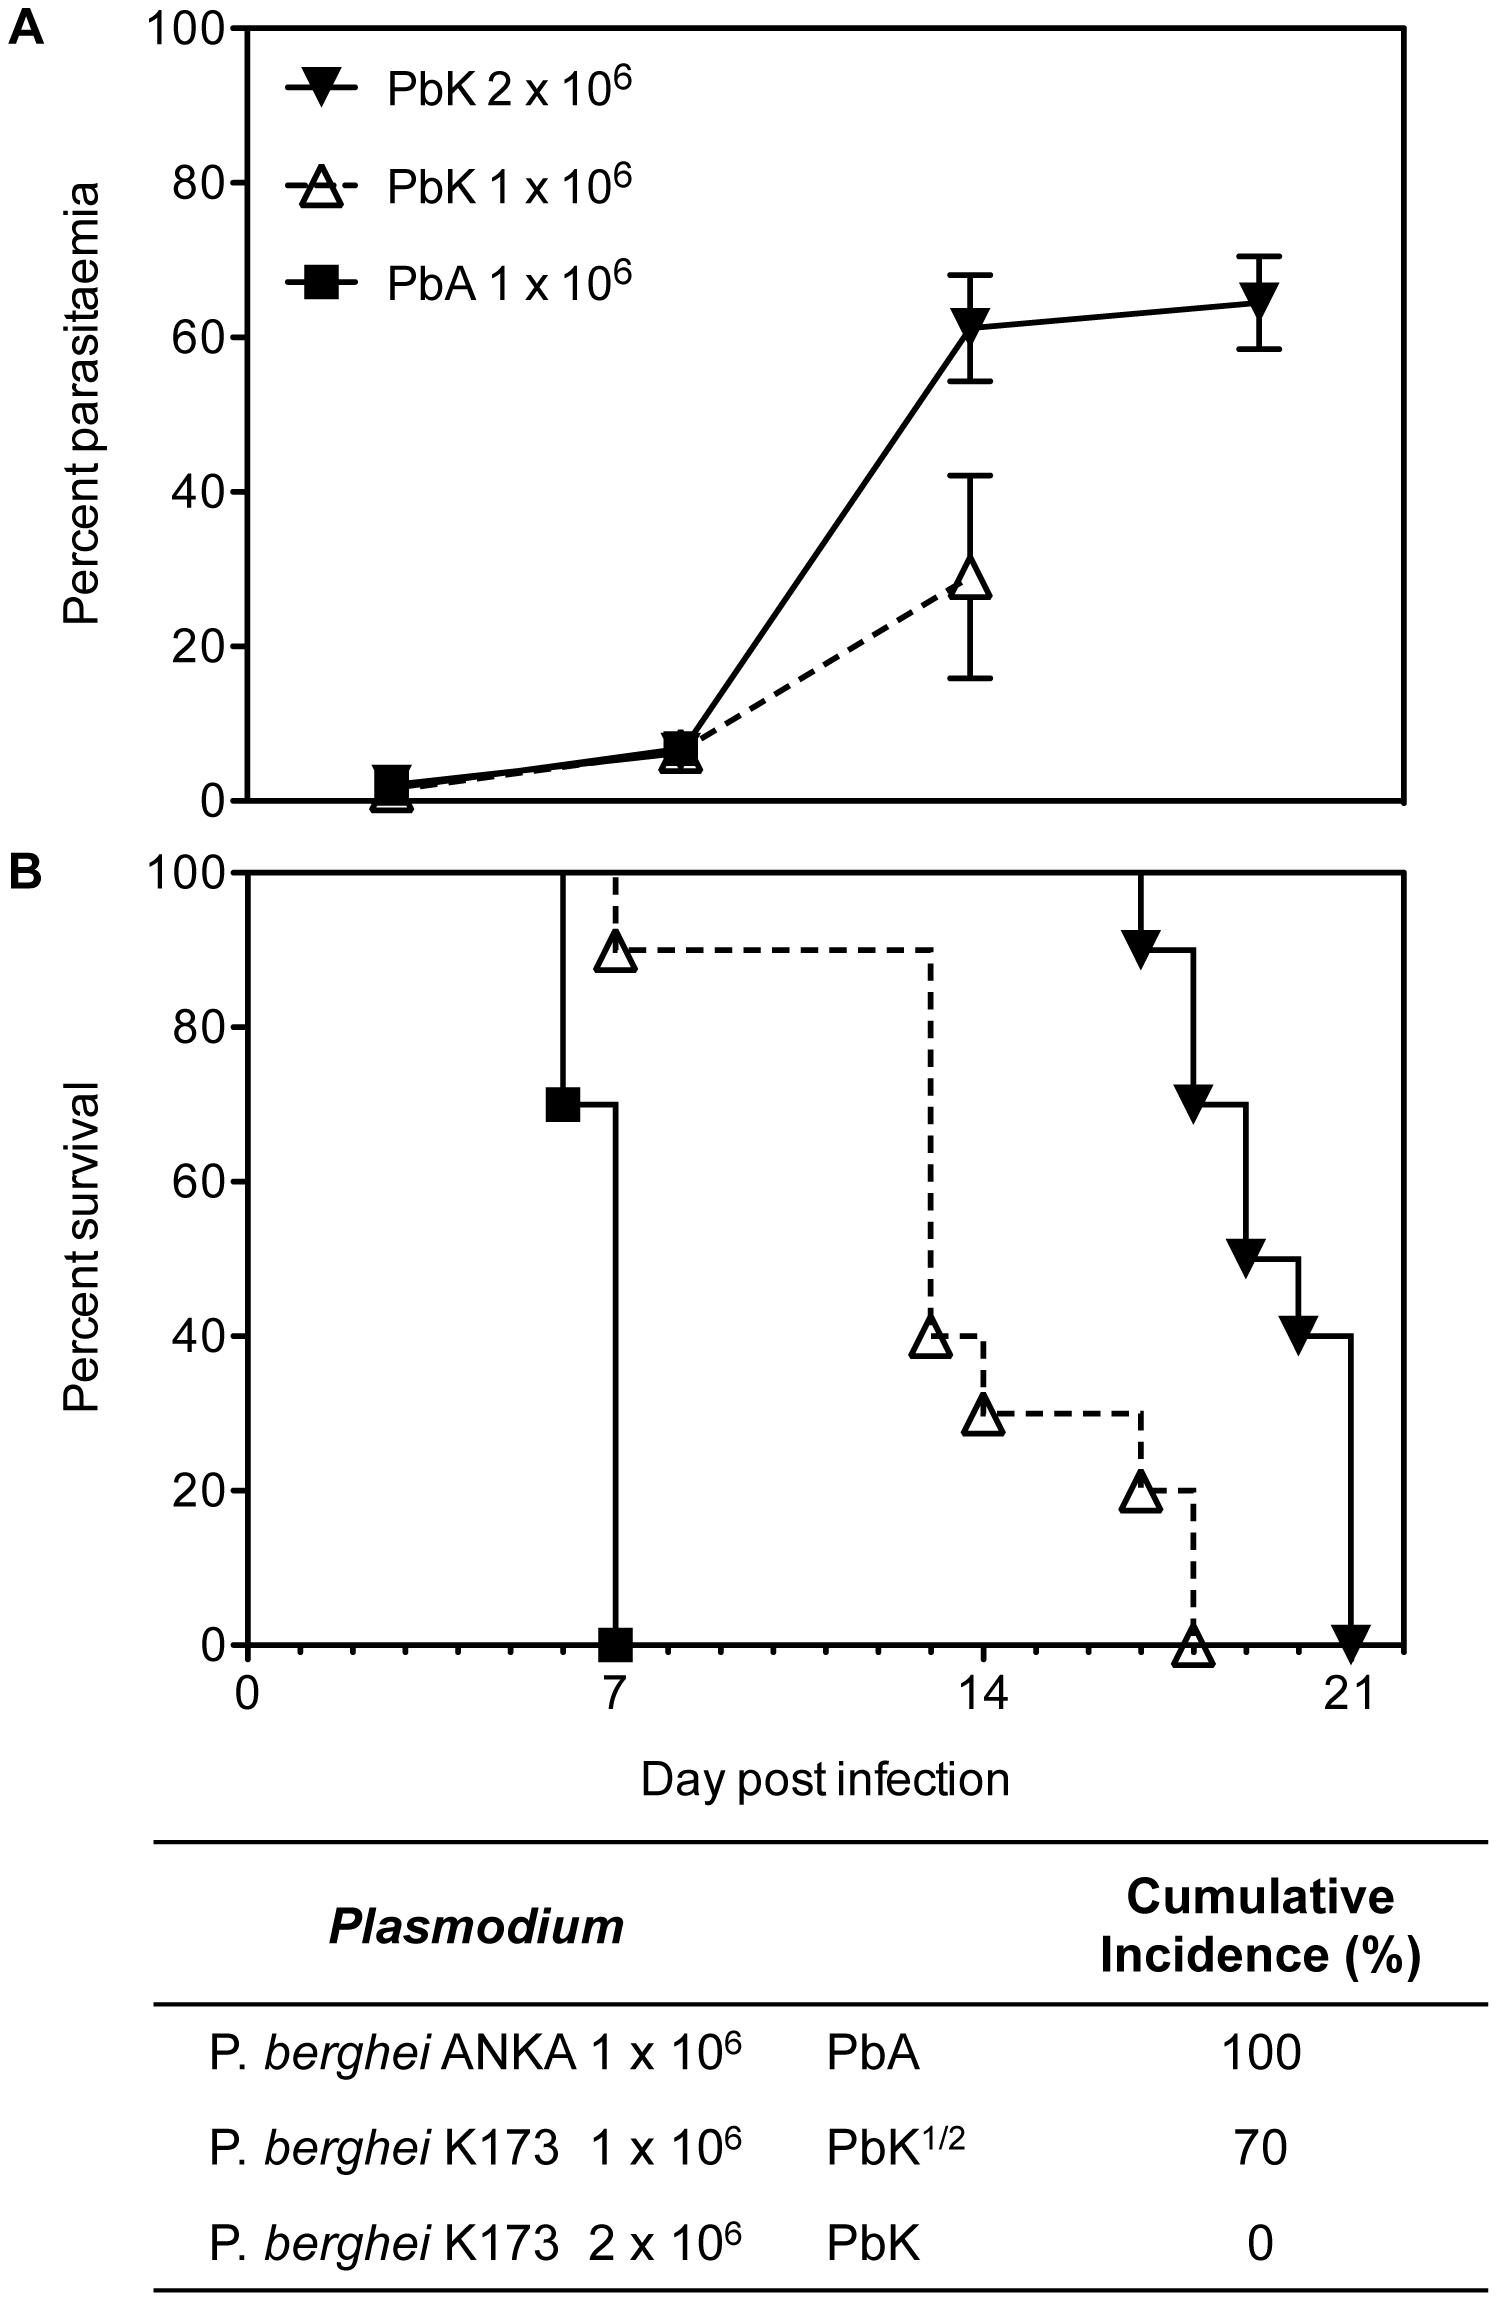 Parasitaemia and survival curves of <i>Plasmodium berghei</i>.